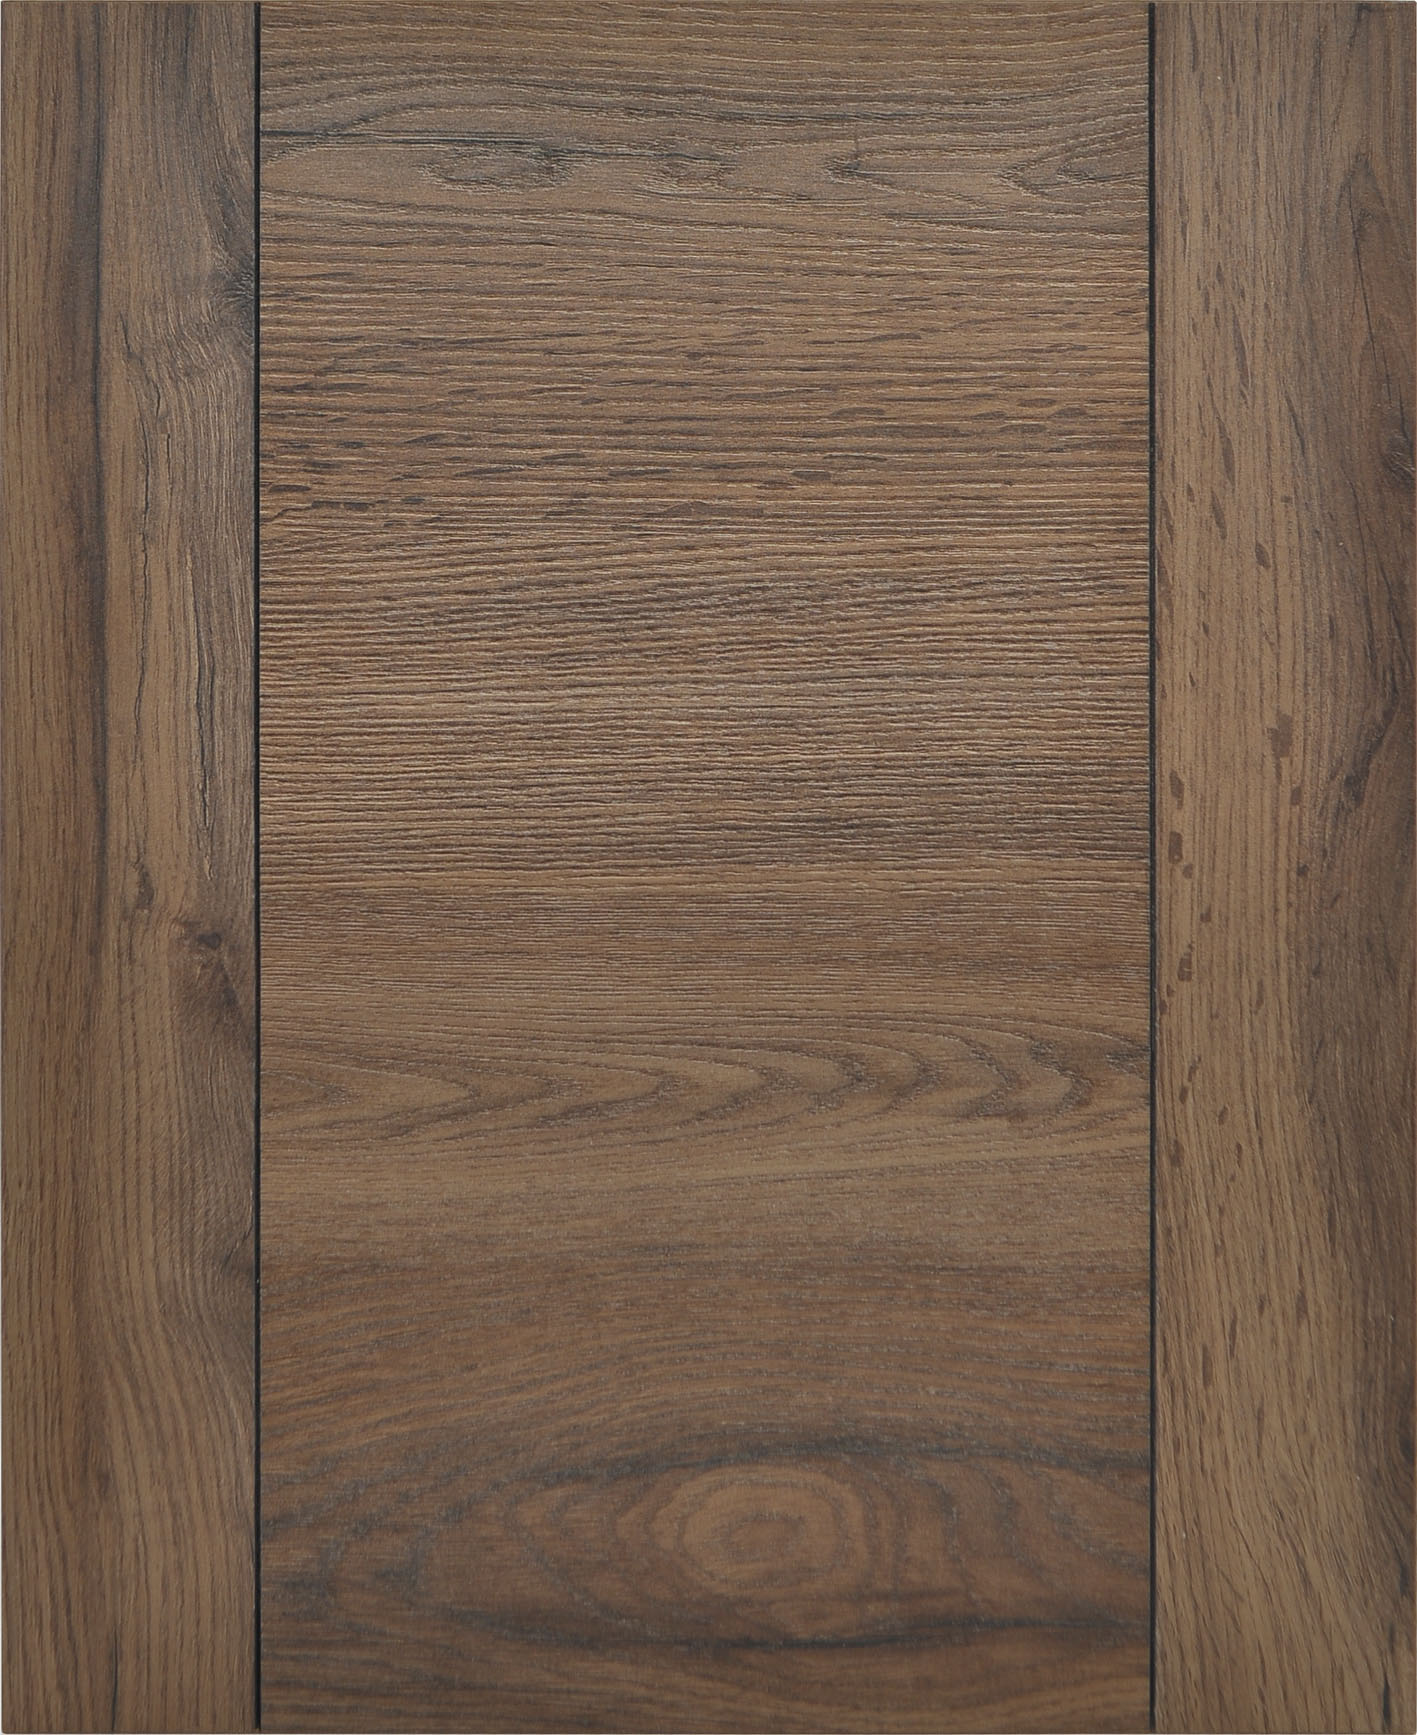 Flat Frame 1582-FL